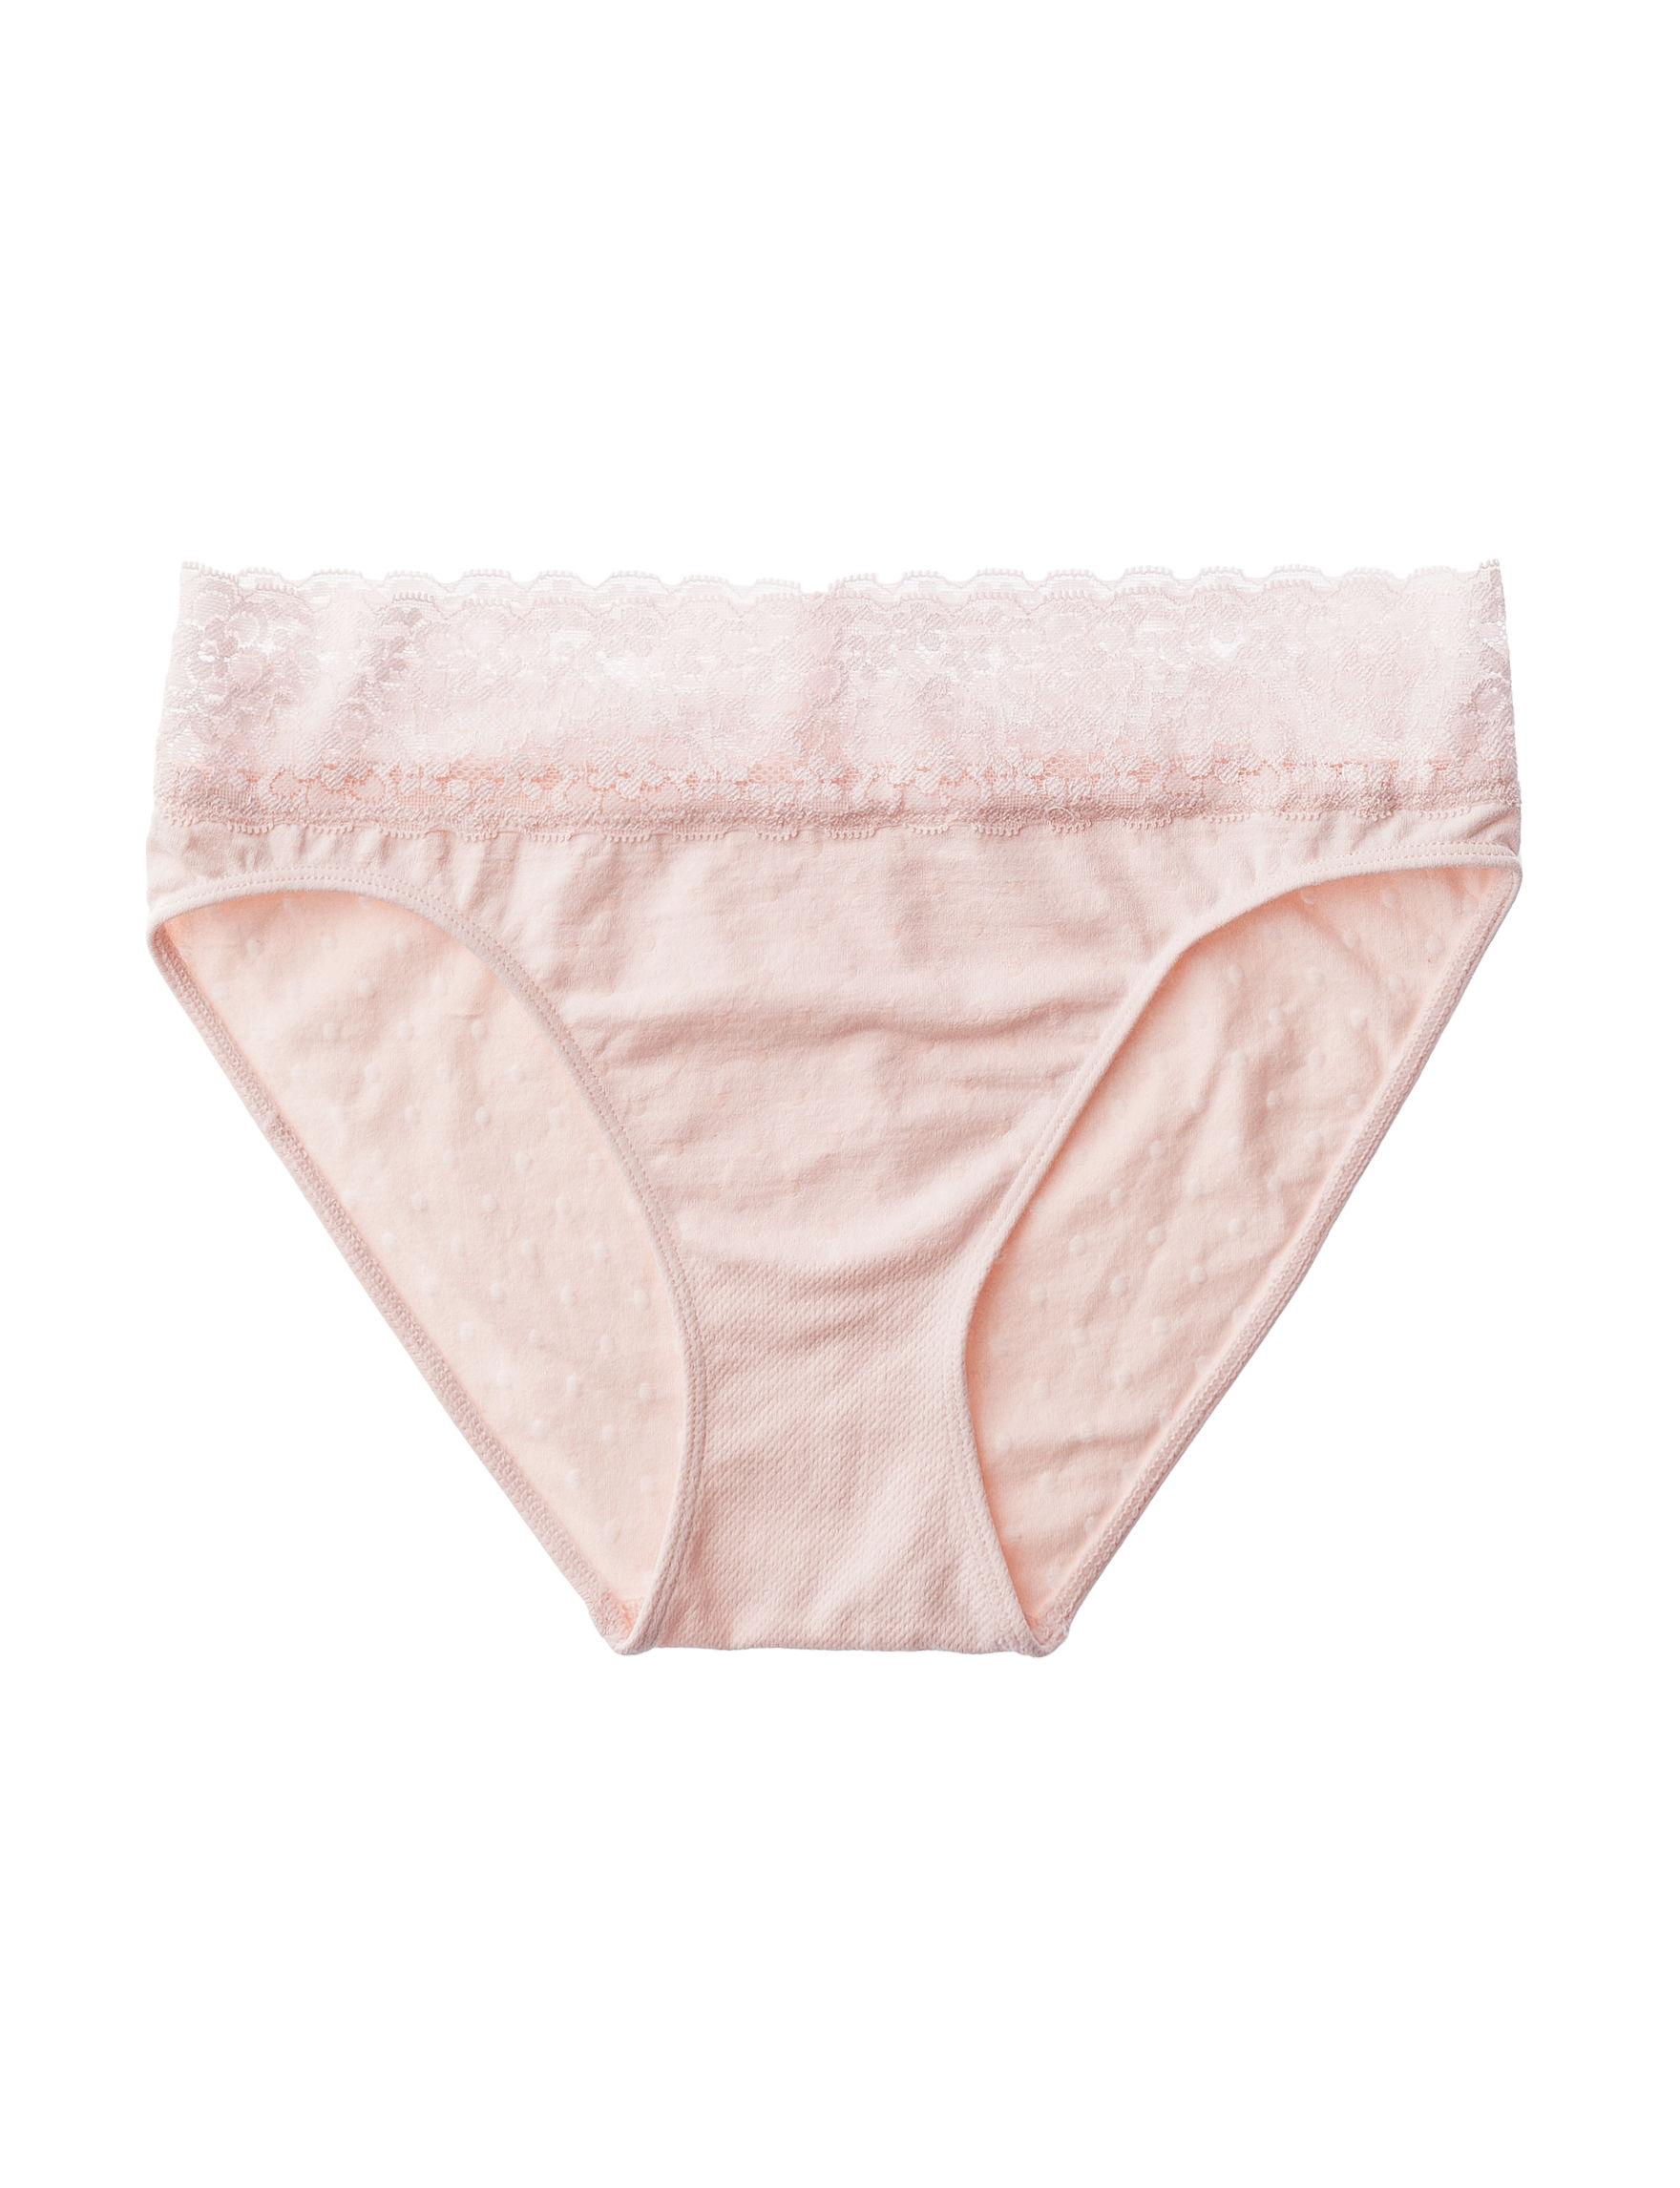 Rene Rofe Pink Panties Bikini